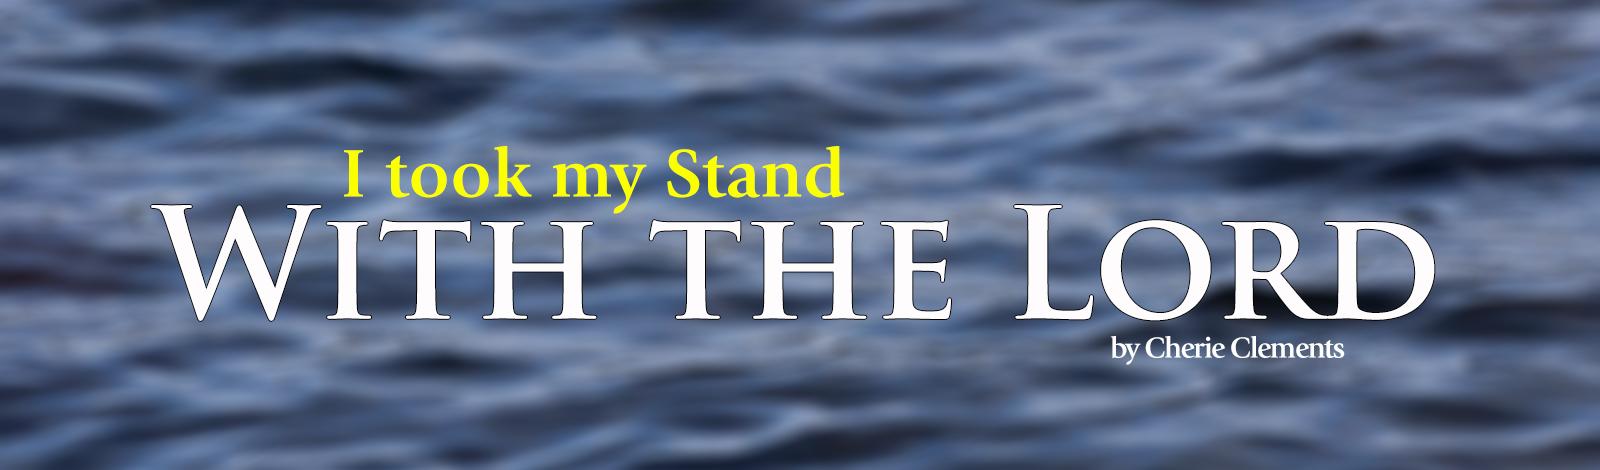 I took my Stand